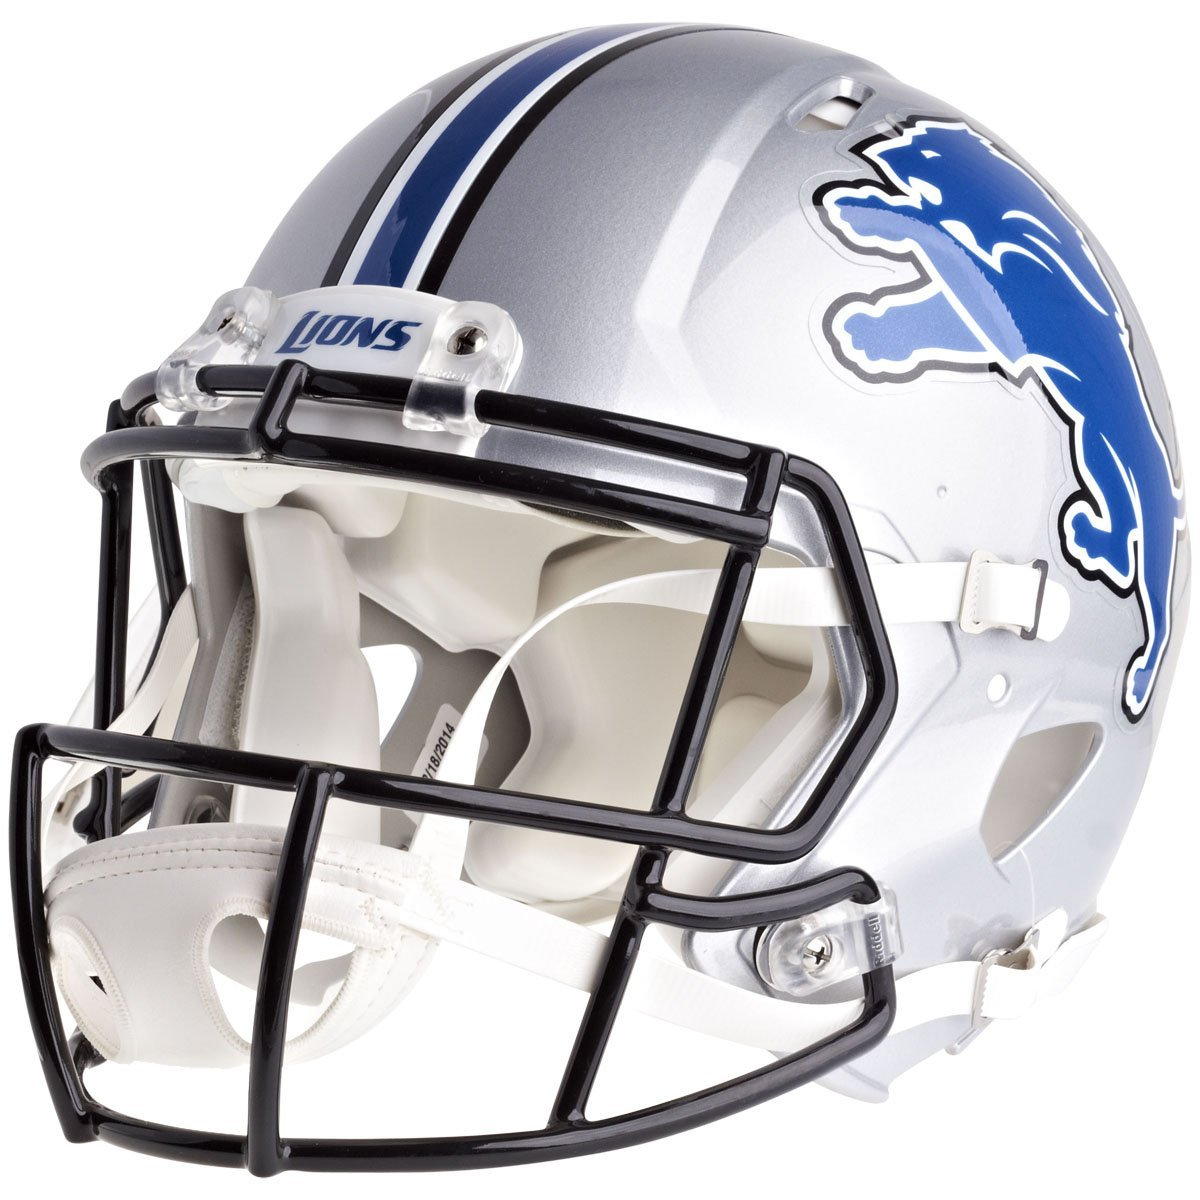 Riddell Revolution 本物 ヘルメット - NFL デトロイトライオンズ (Detroit Lions)   B004VBDY98